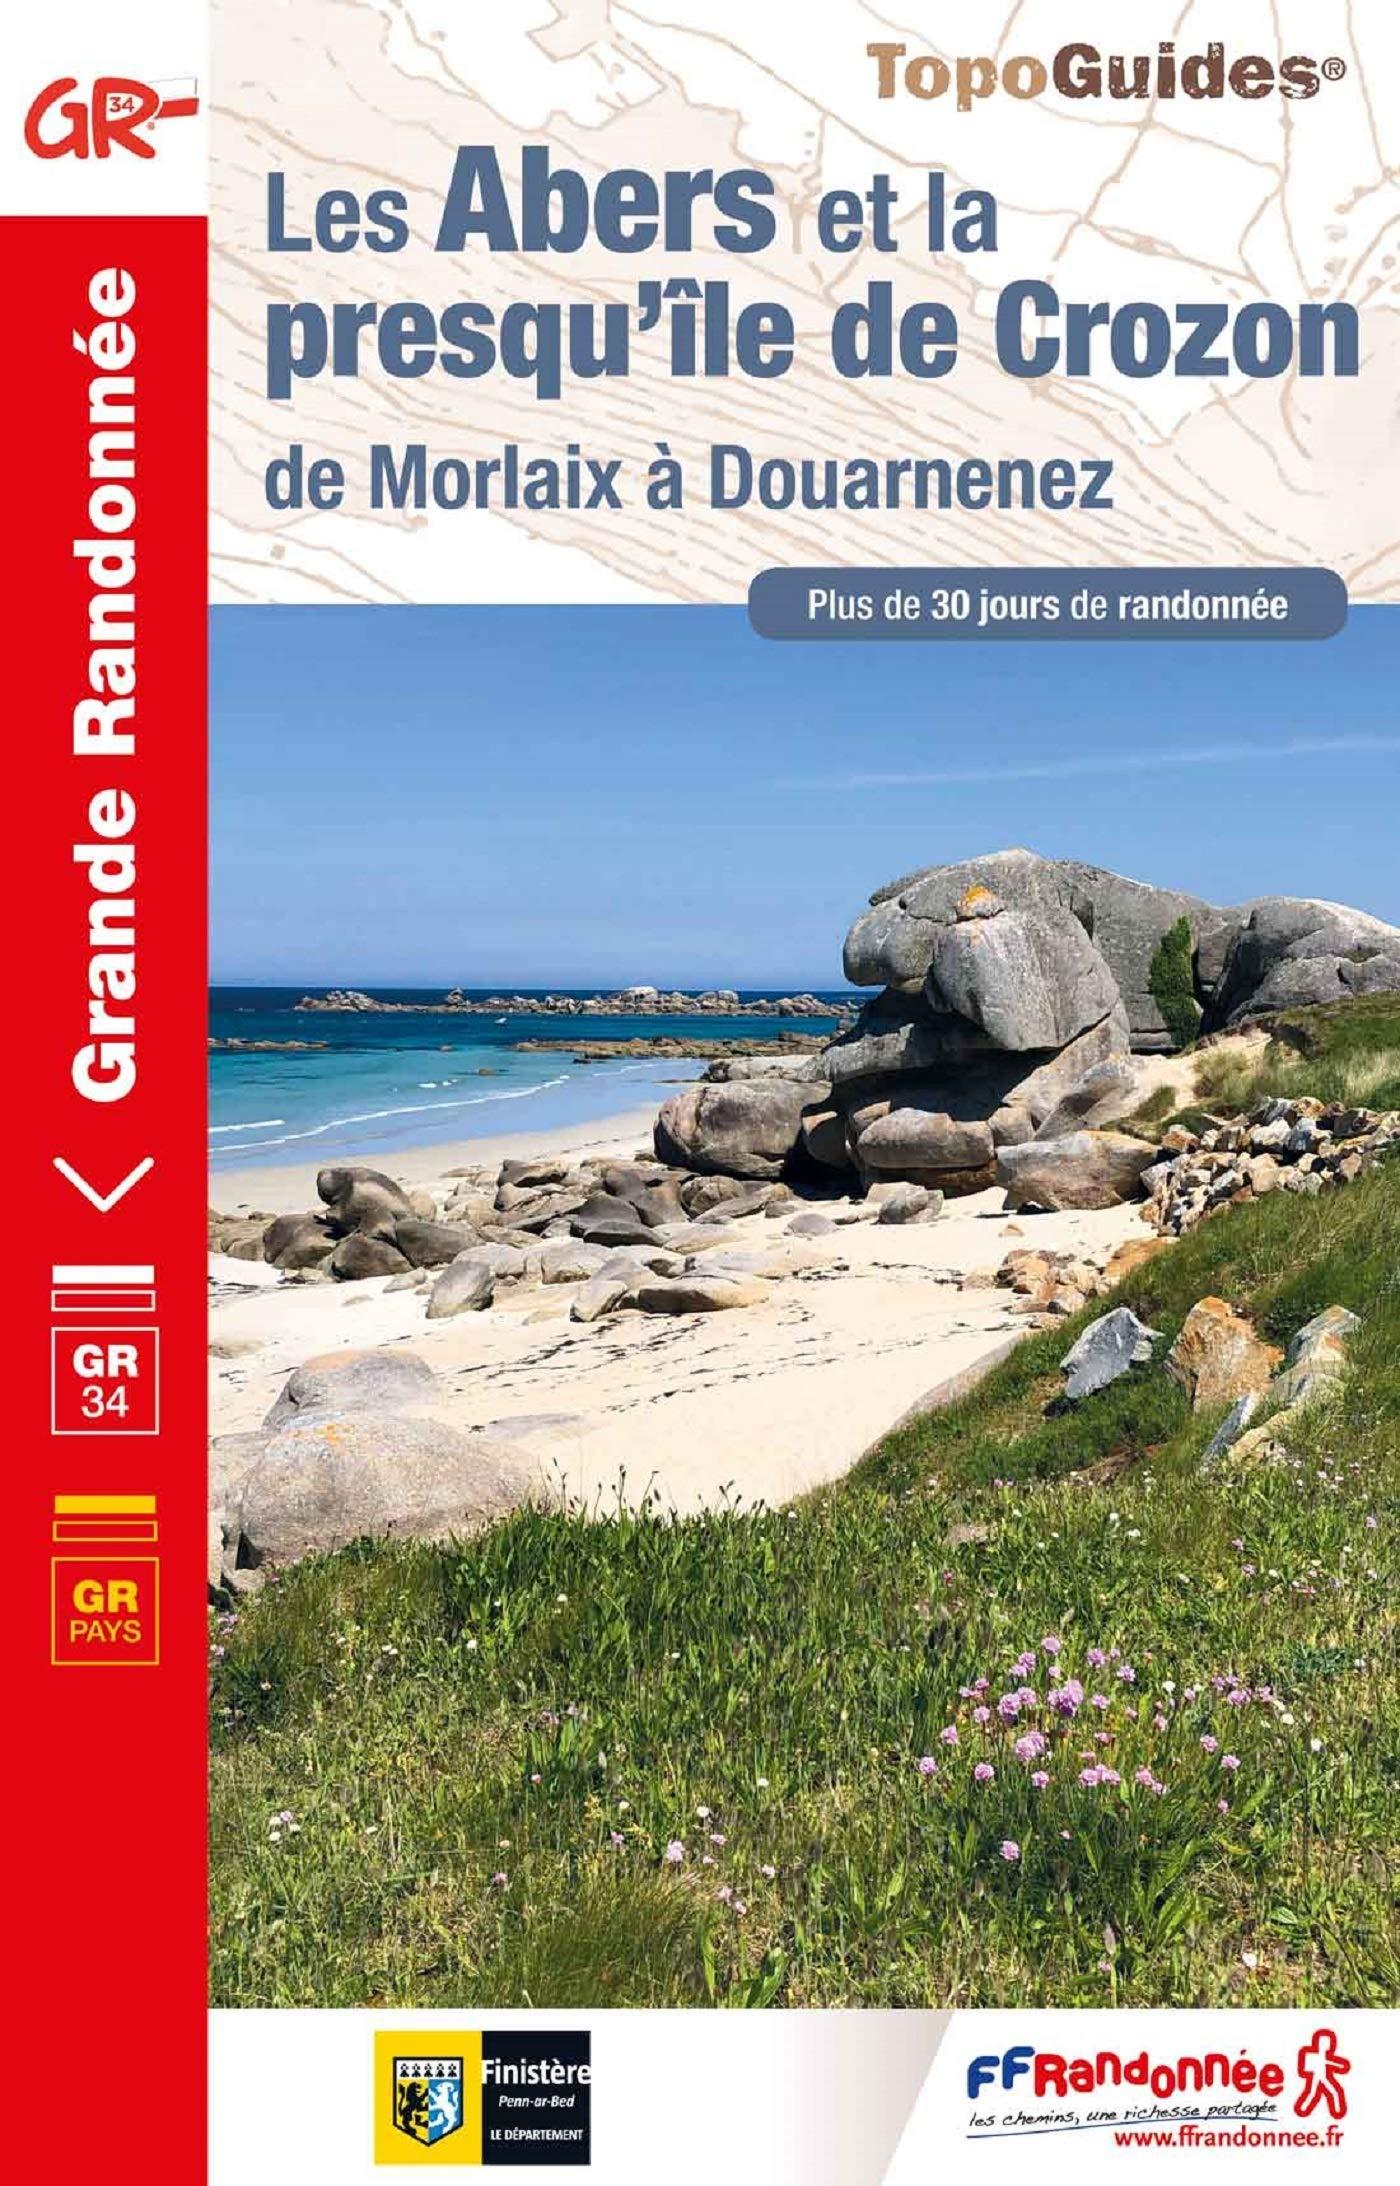 TG347  Pays des Abers, Chemin des Phares | wandelgids GR-34/GR-341 9782751410550  FFRP Topoguides  Meerdaagse wandelroutes, Wandelgidsen Bretagne